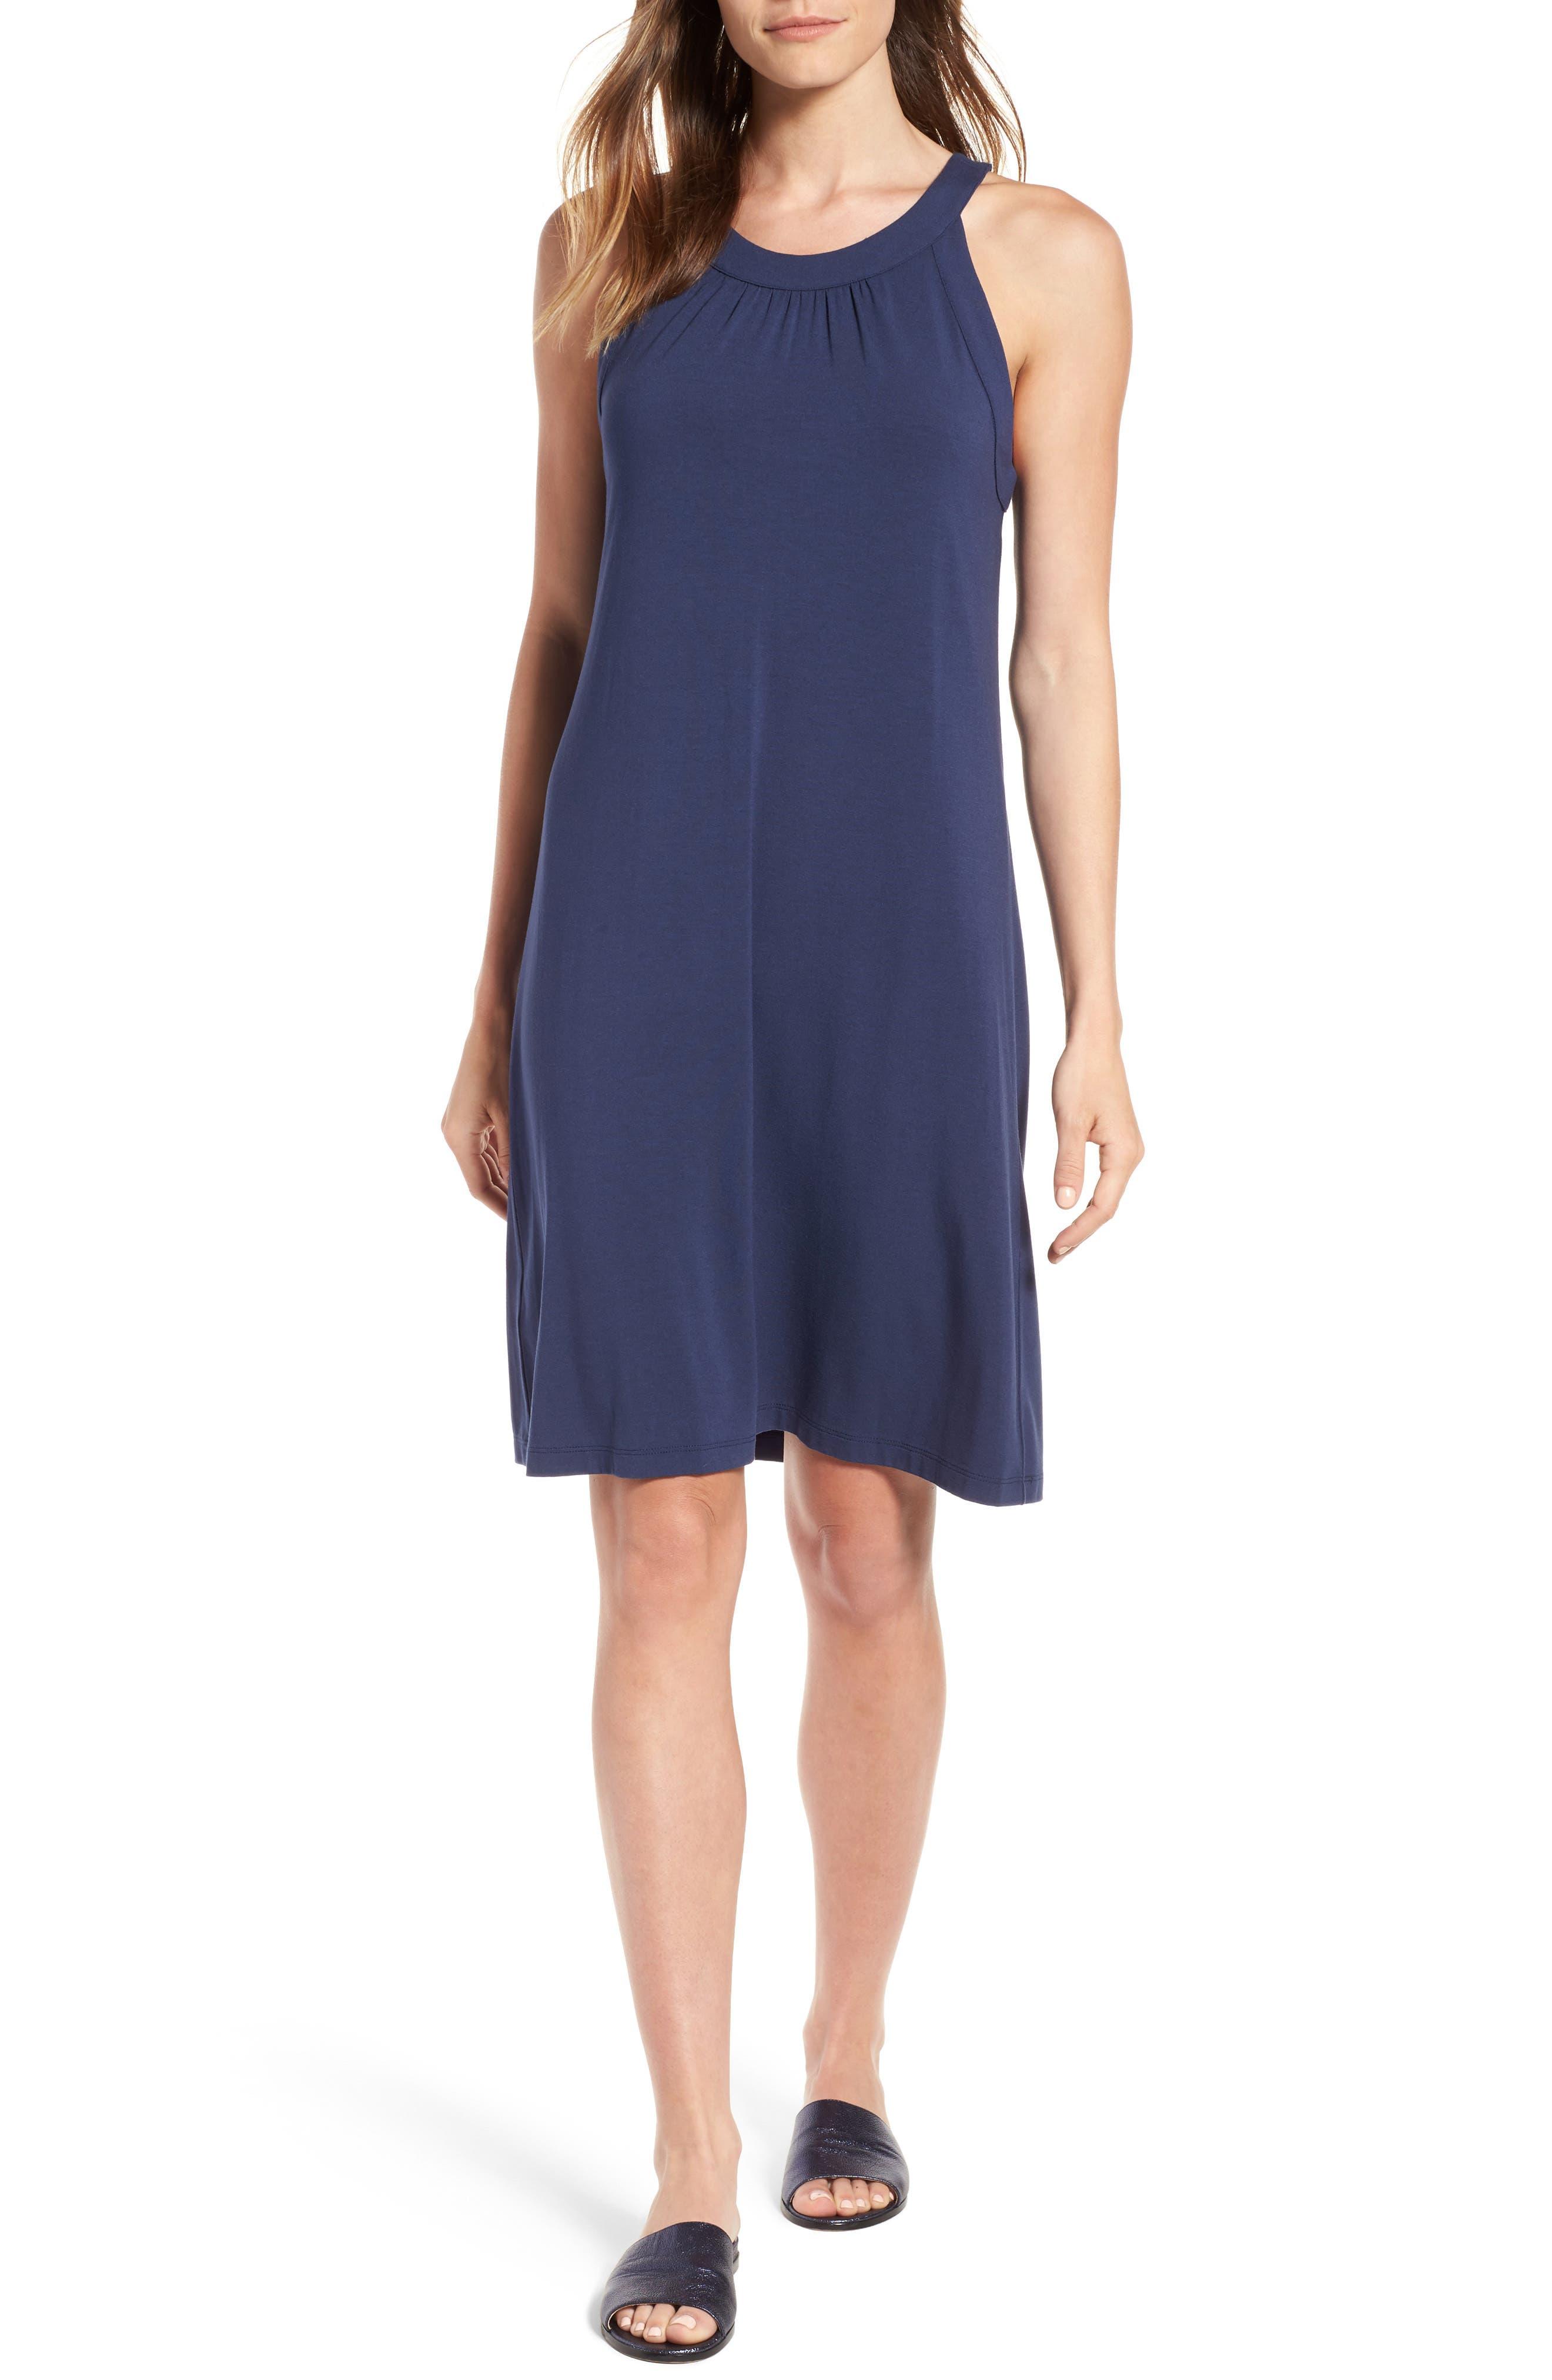 TAMBOUR SHIFT DRESS